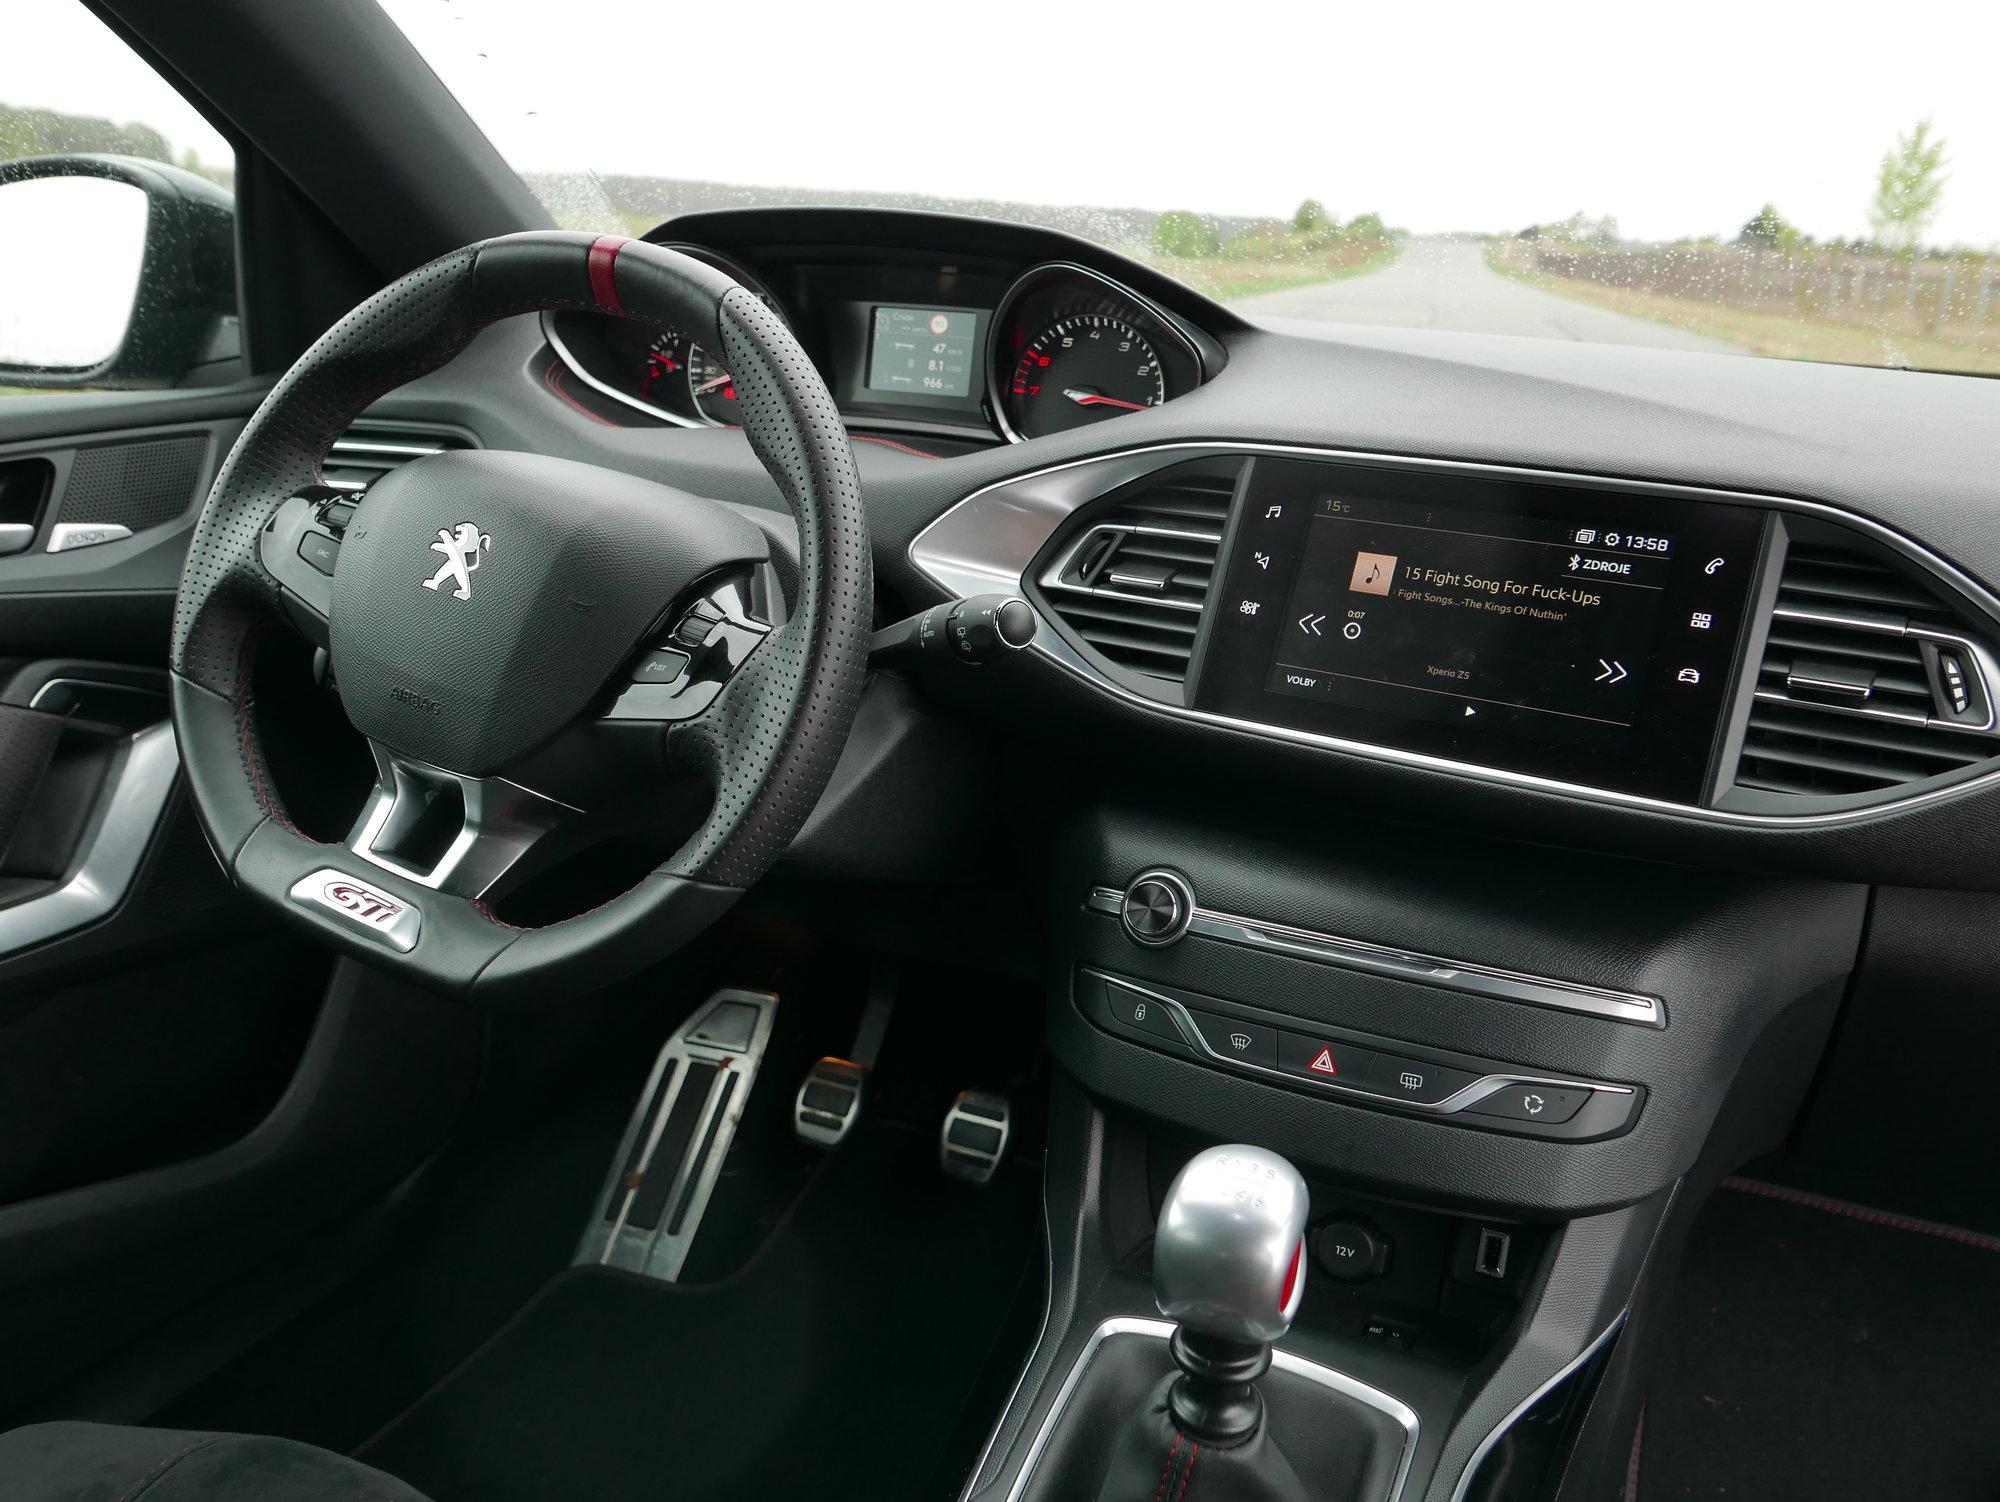 Peugeot 308 GTi 1.6 THP 270